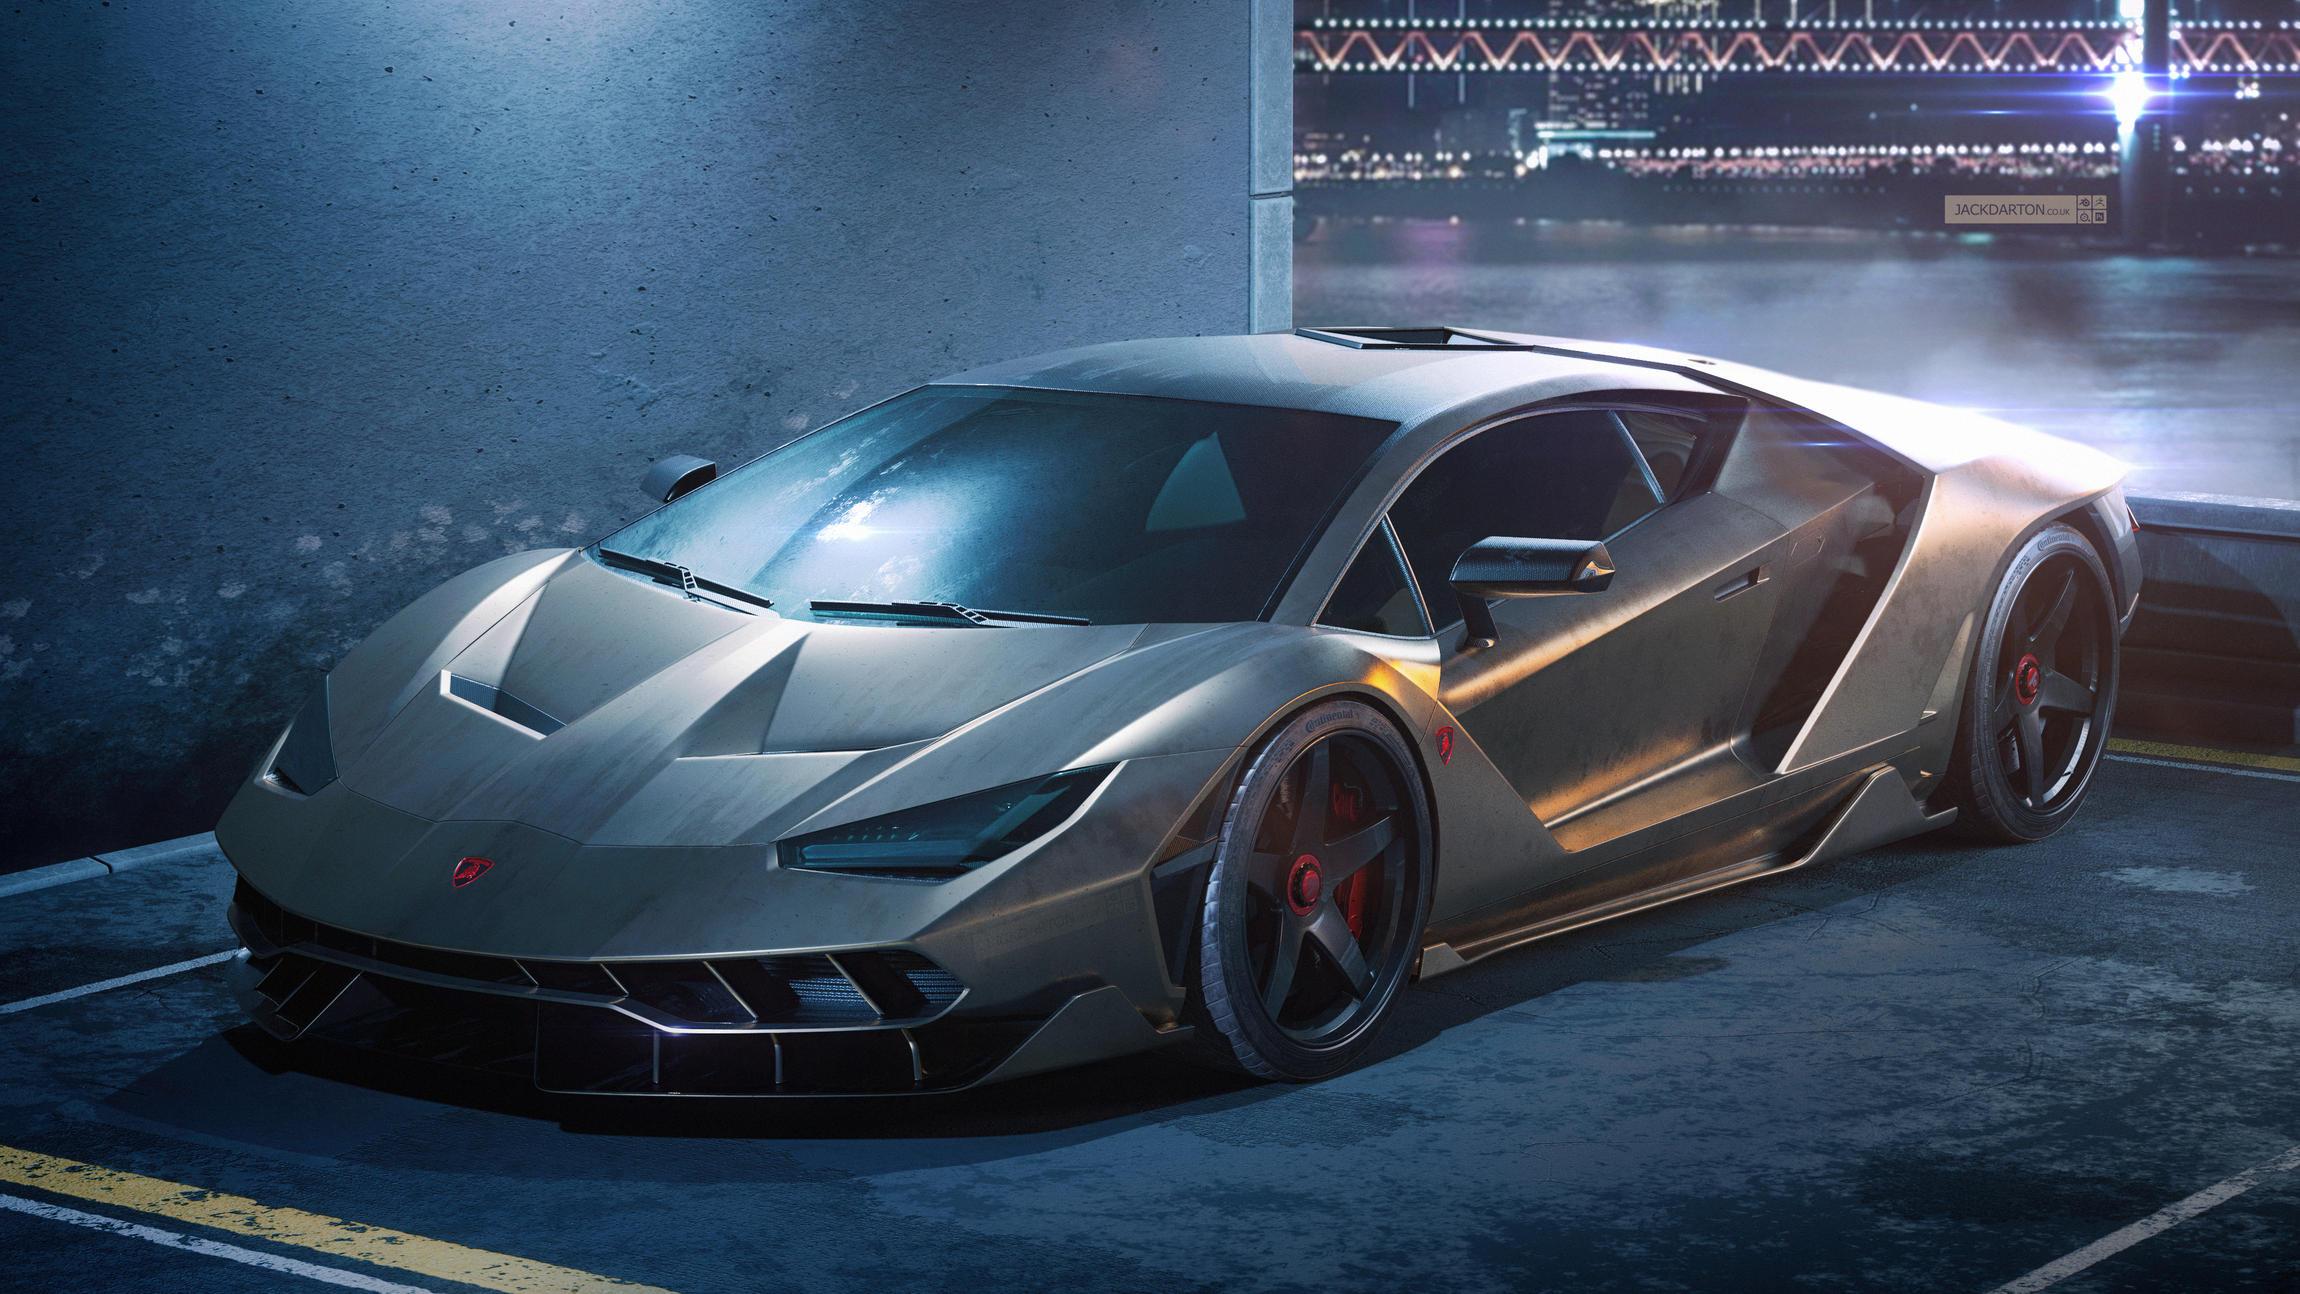 Lamborghini Centenario Forum Gallery Blender Artists Community